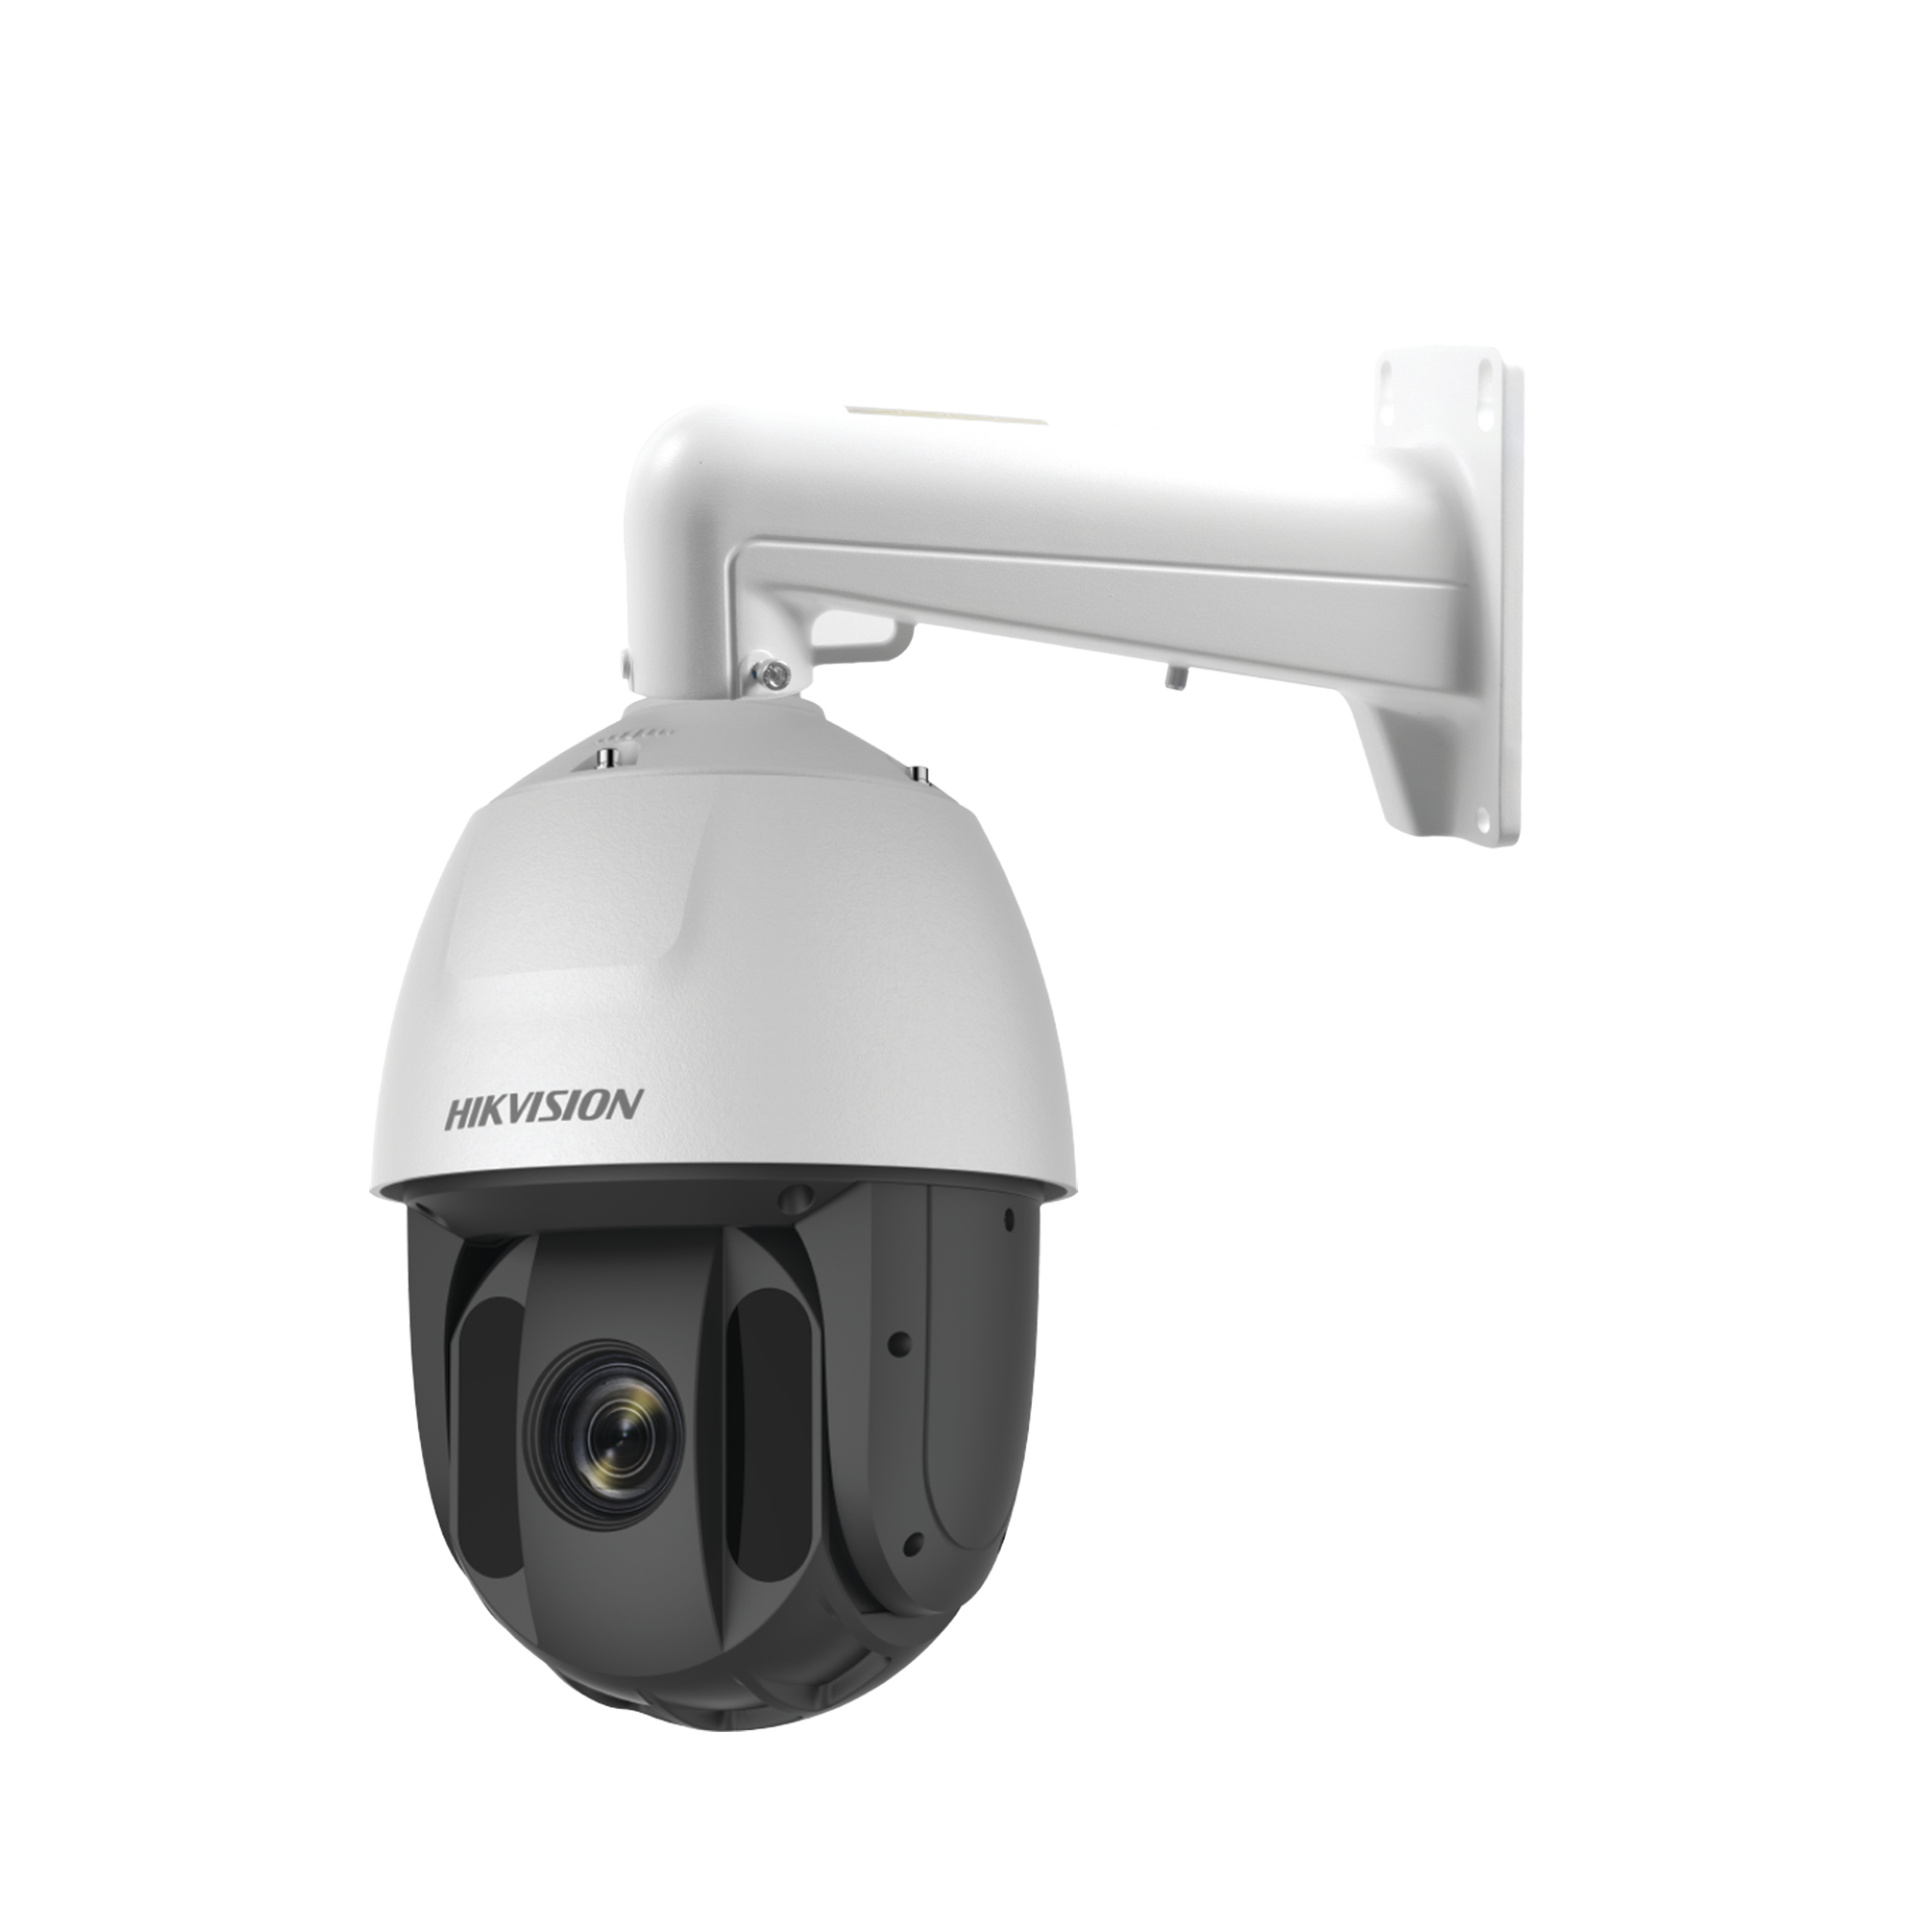 Domo PTZ TURBOHD 1080P / 25X Zoom / 150 mts IR / Exterior IP66 / WDR 120 dB / TVI-AHD-CVI-CVBS / RS-485 / Ultra Baja Iluminación